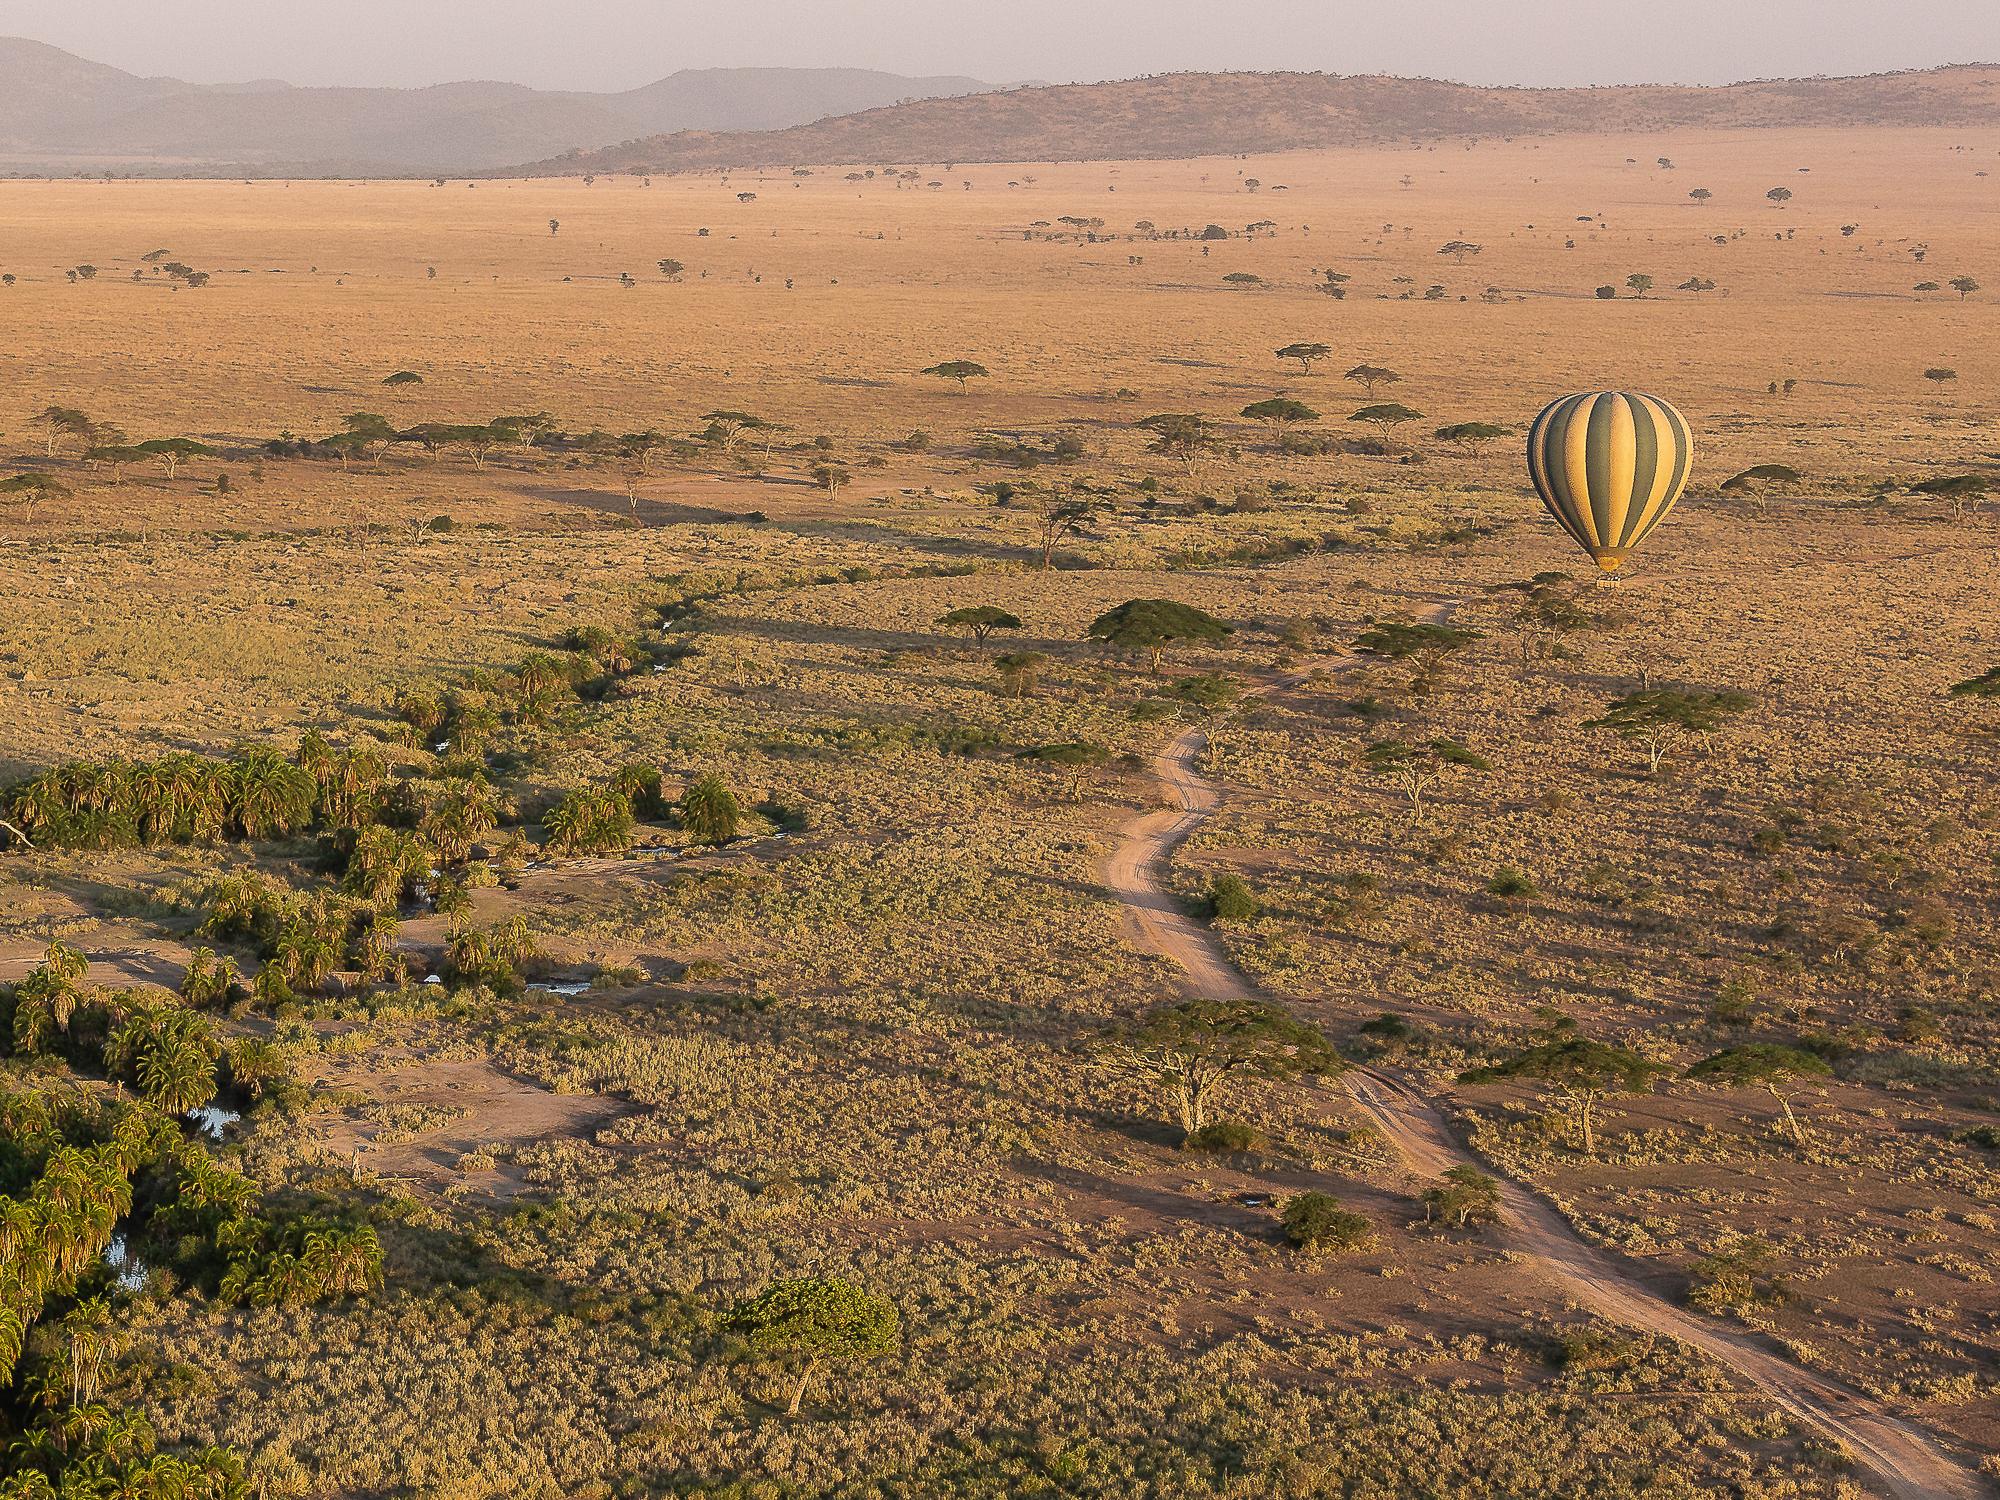 A hot air balloon surveys the African plains